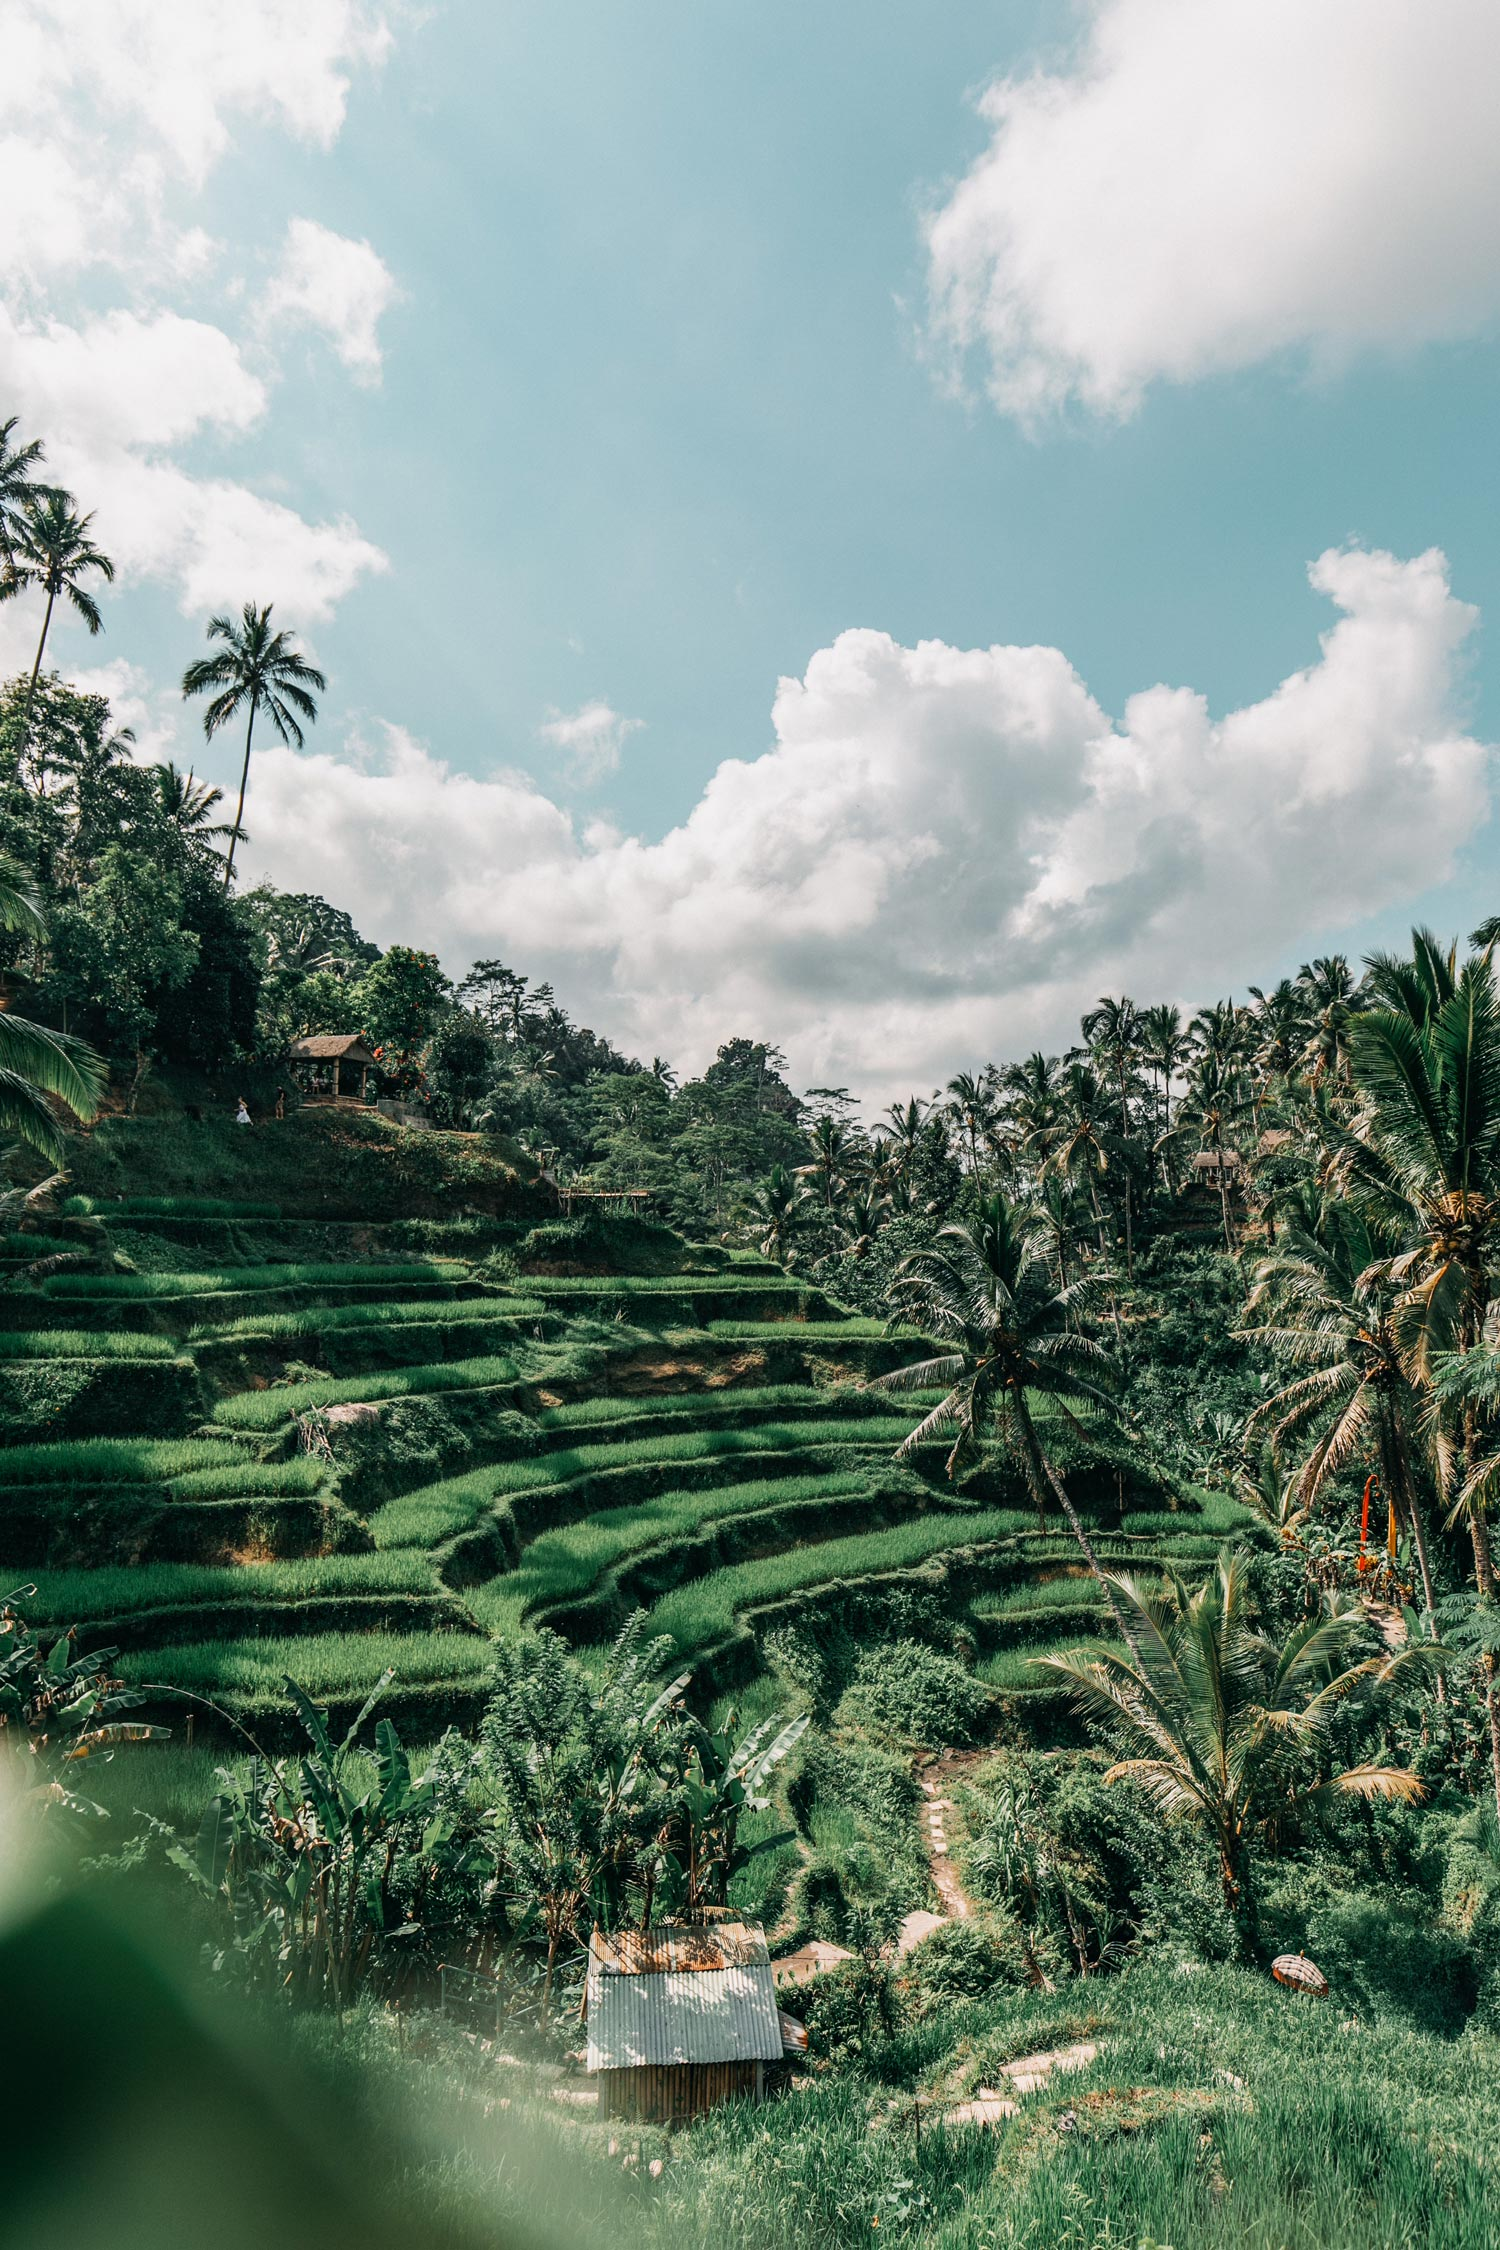 bali-indonesia-yoga-retreat-travel-photography-20.jpg